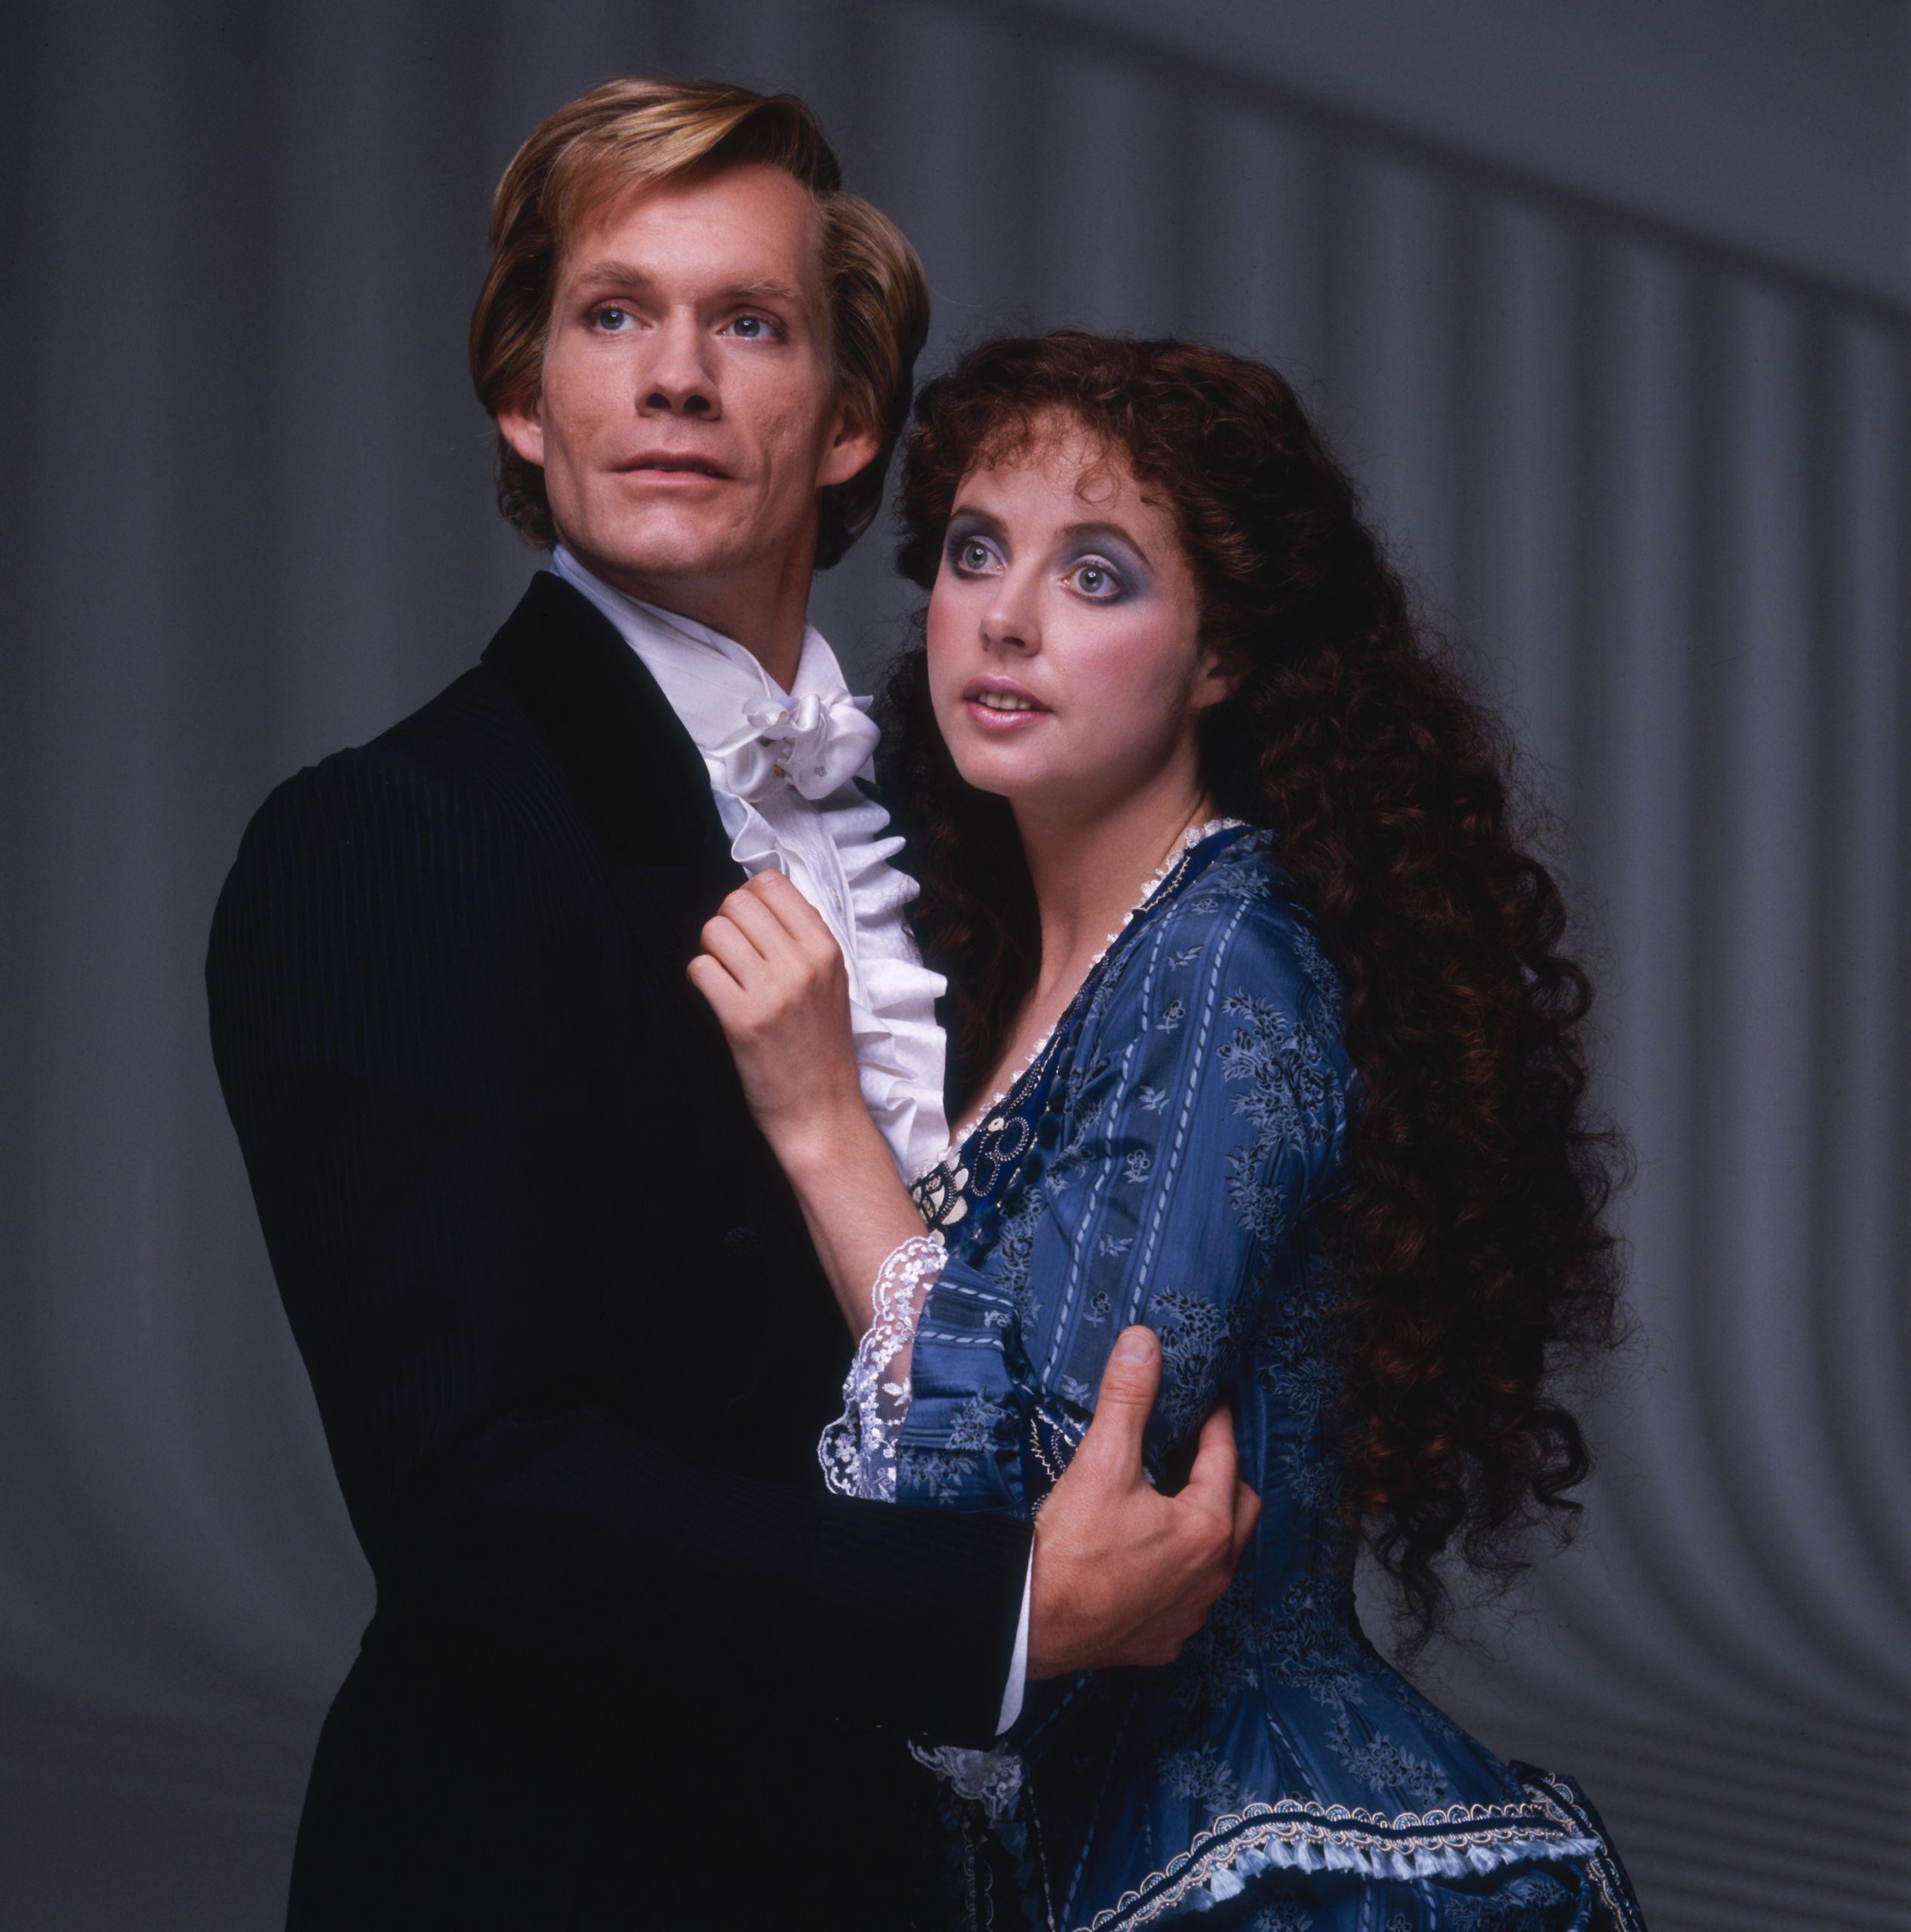 Sarah Brightman The phantom of the opera Phantom of the